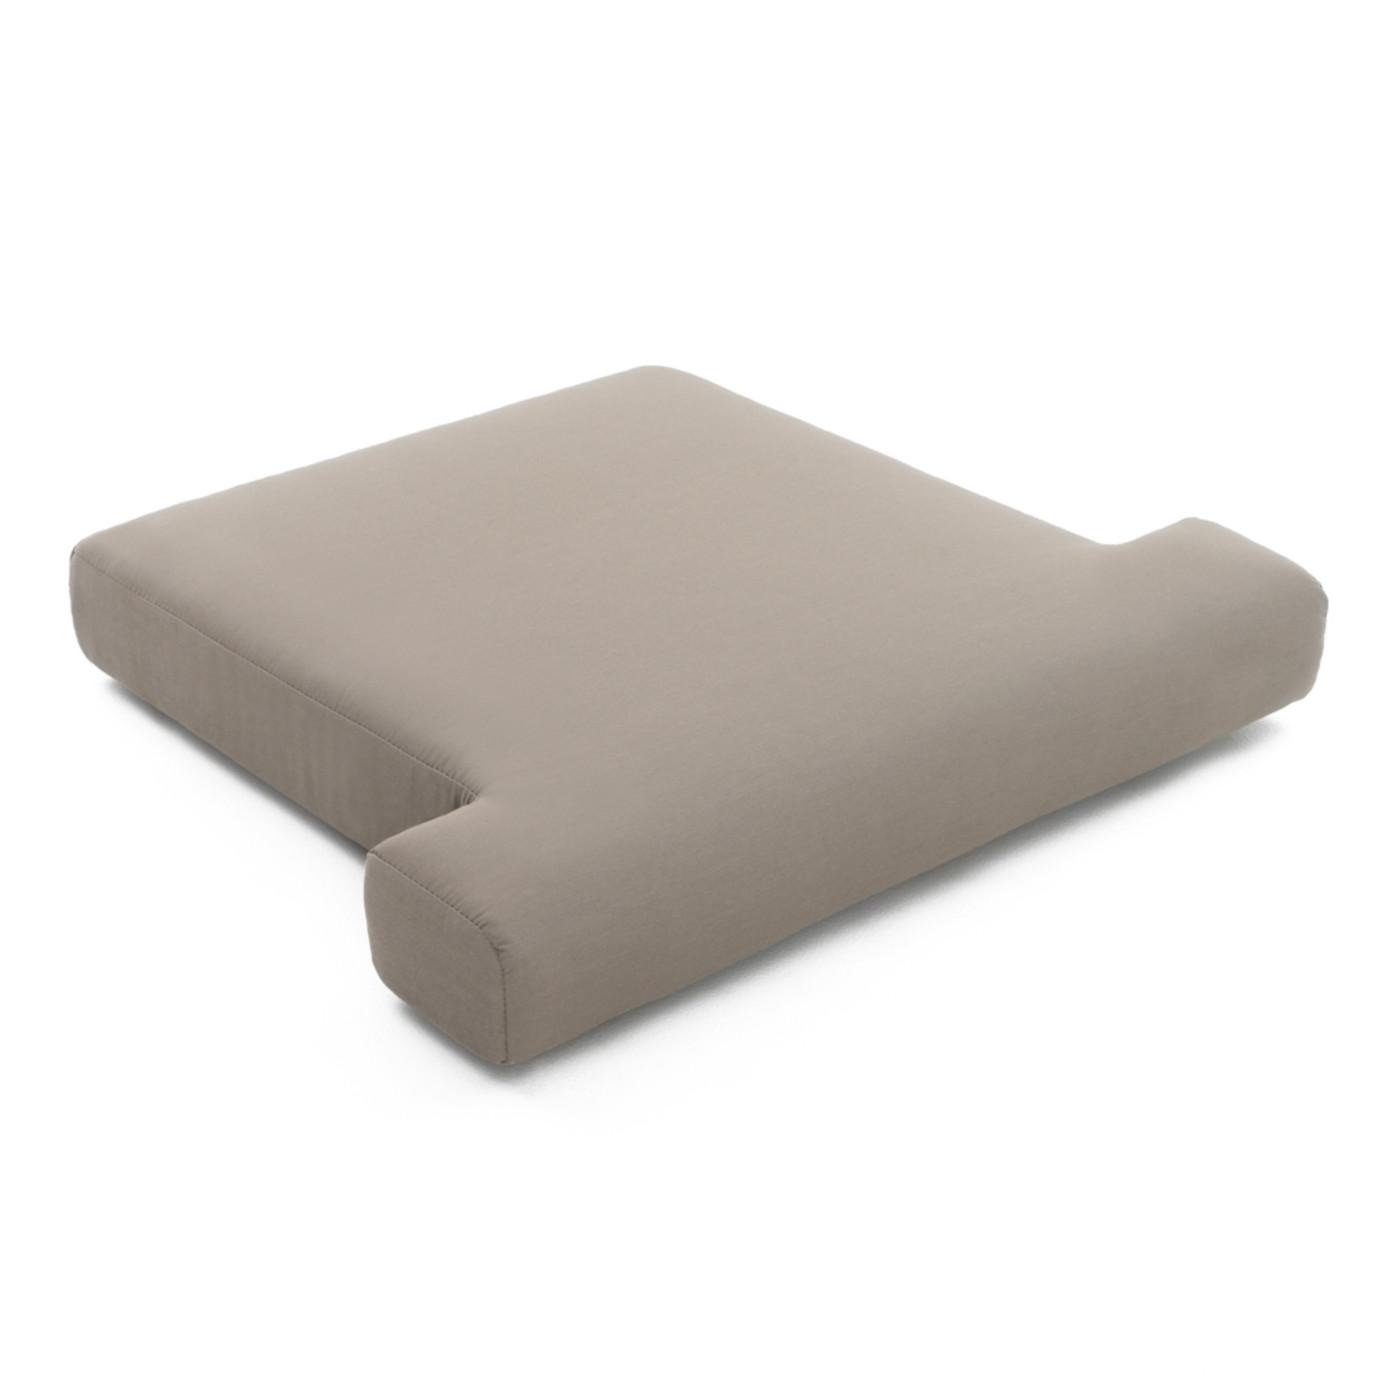 Portofino™ Comfort Club Chair Base Cushion - Kona Taupe